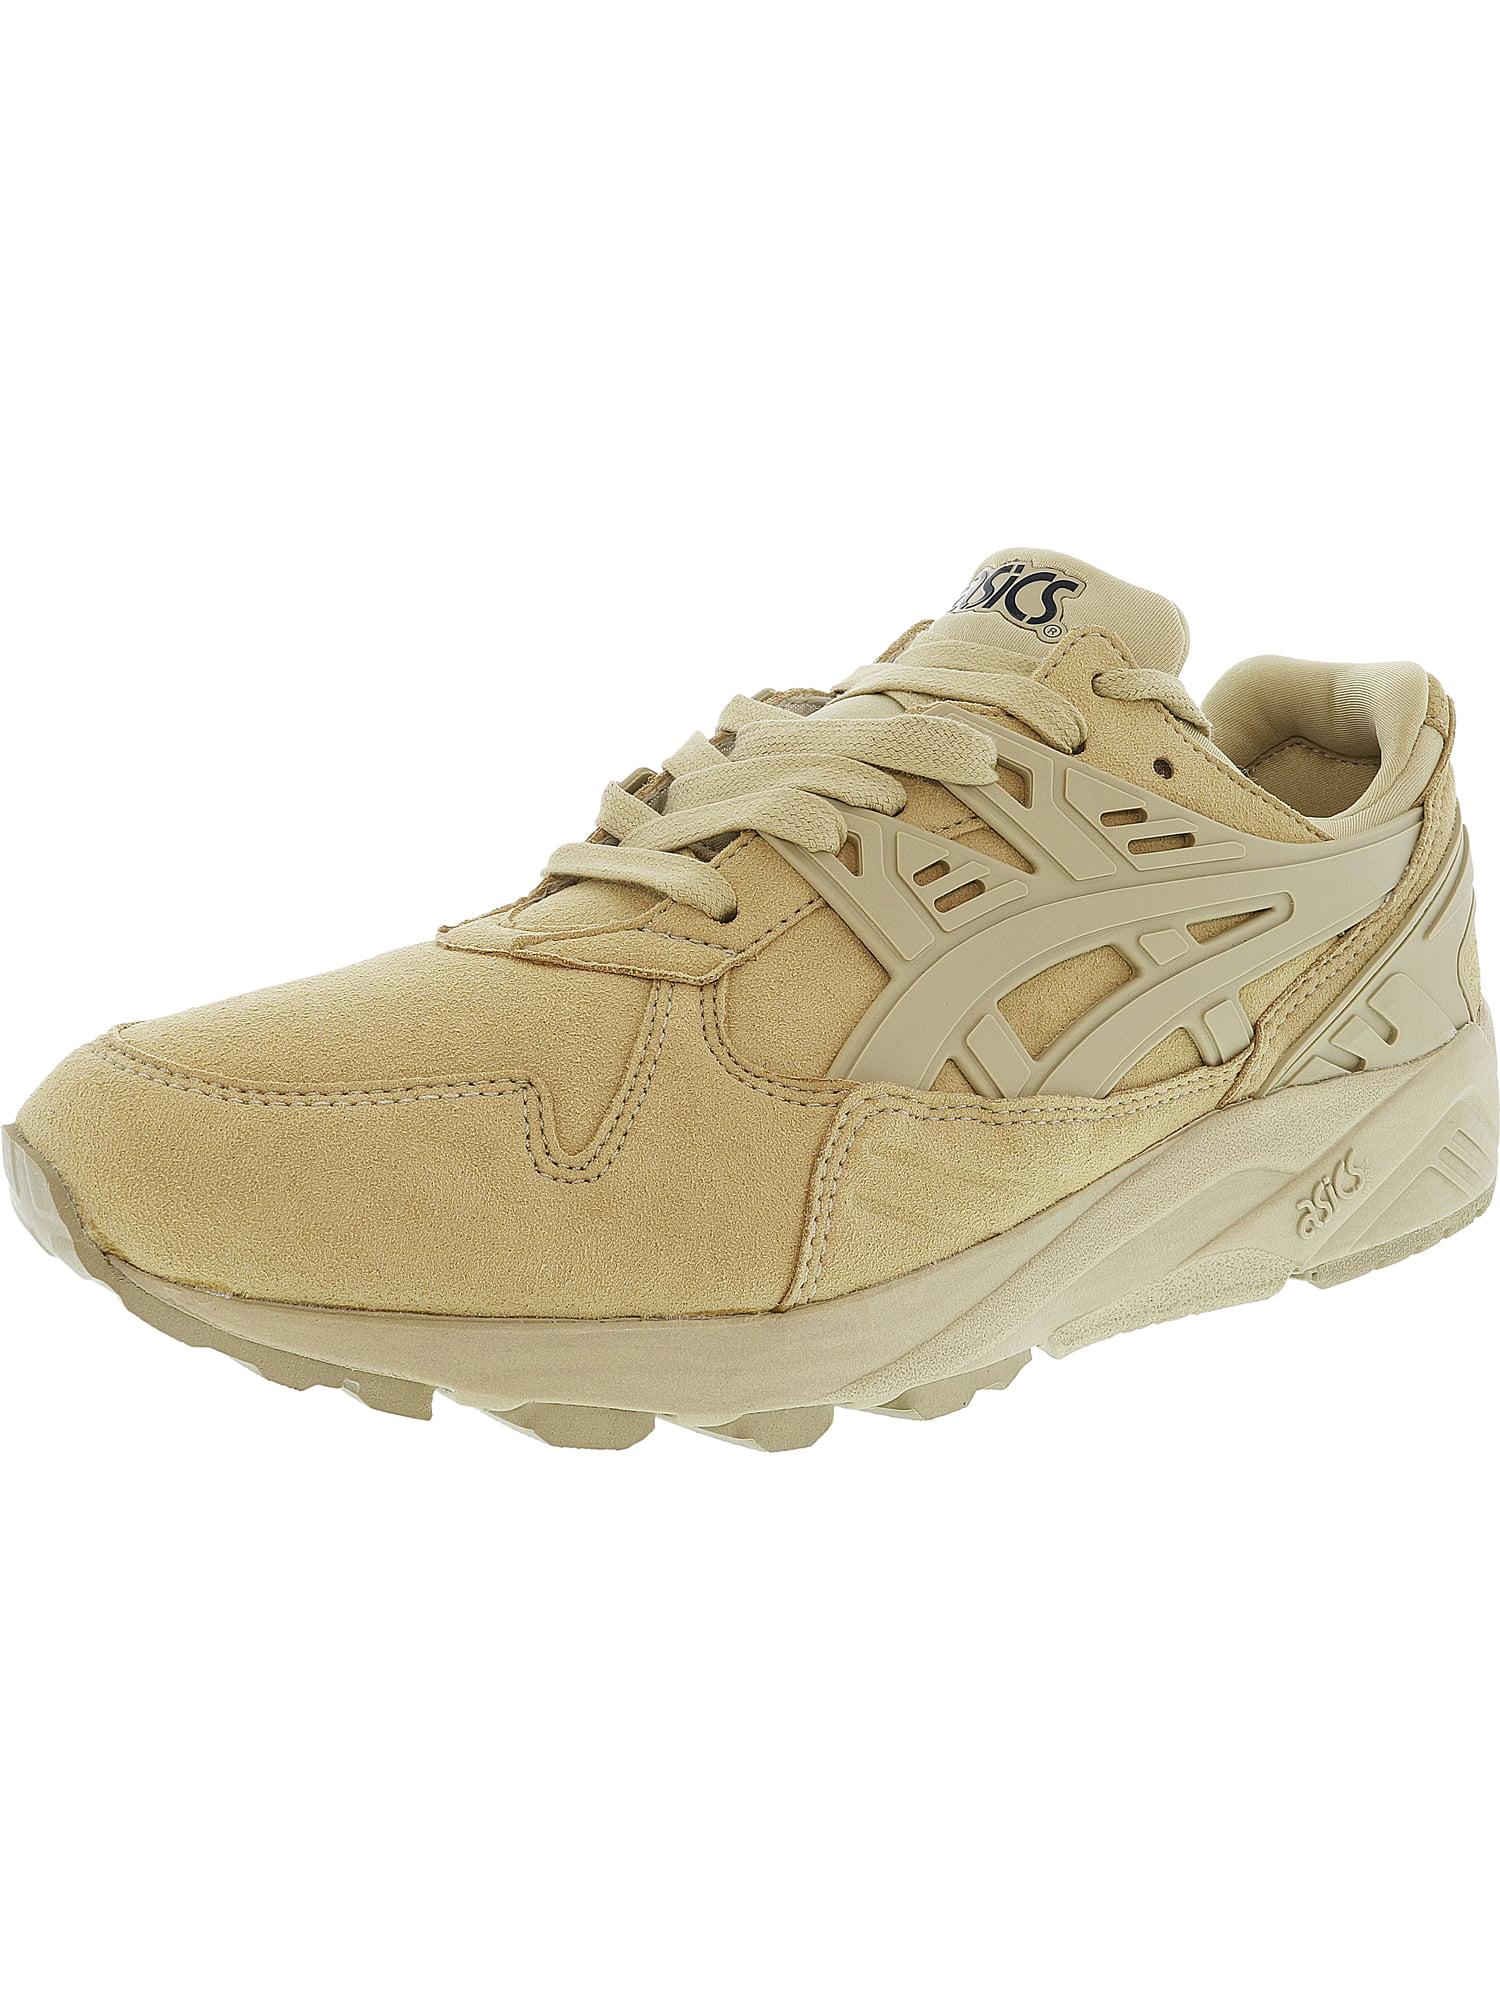 Asics Men's Gel-Kayano Trainer Sand / Ankle-High Running Shoe - 10M